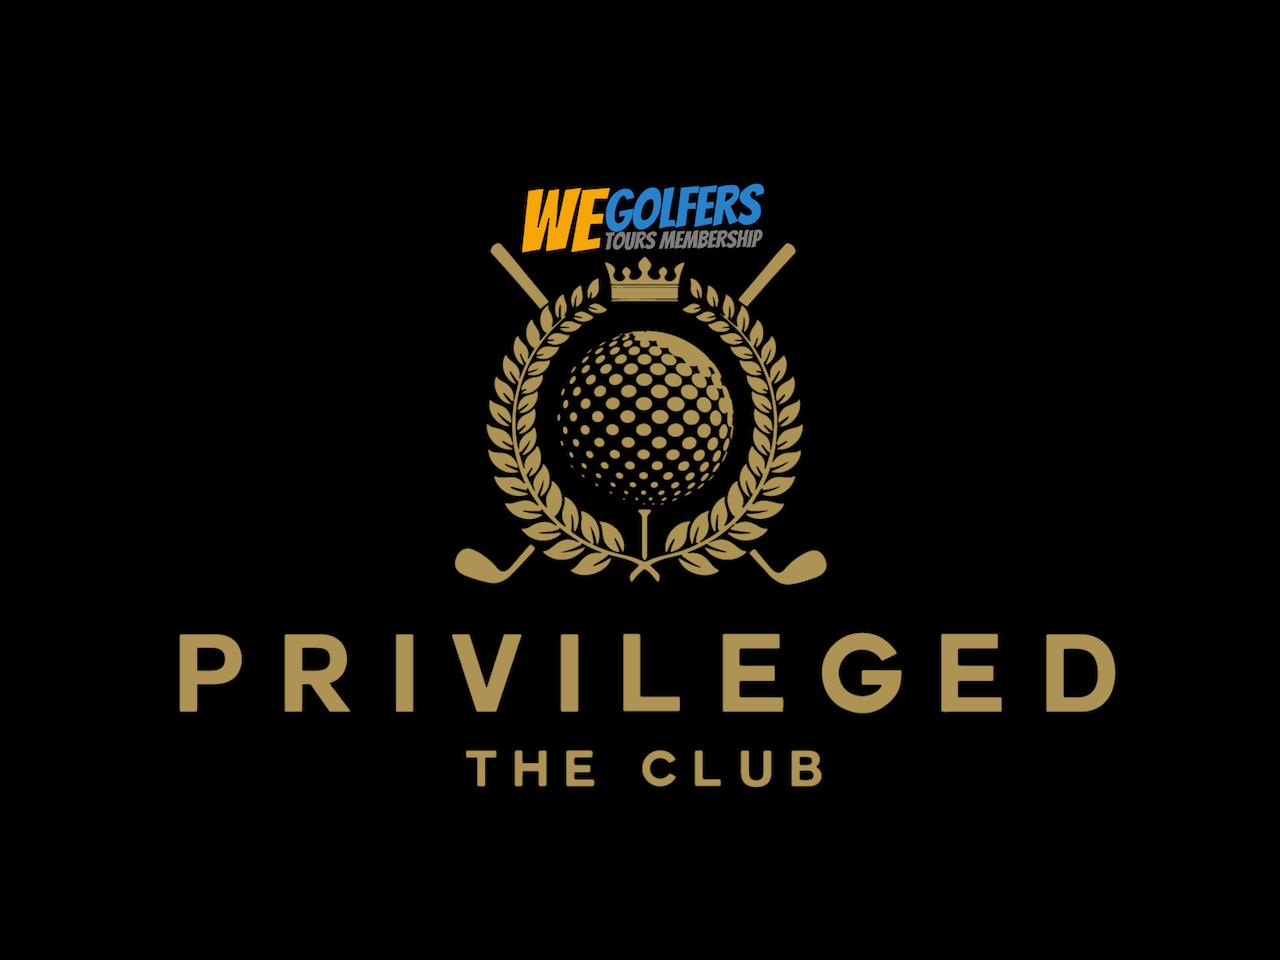 Privileged_Wegolfers1280_960_rounded